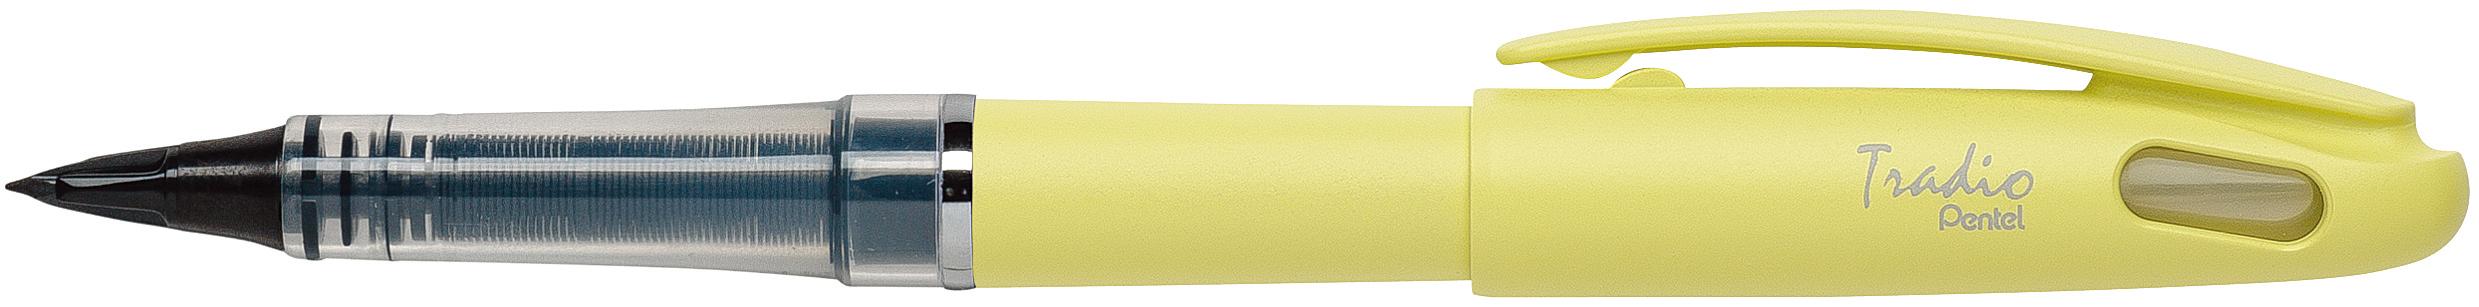 Pentel Tradio Pastel - Feutre plume - corps jaune